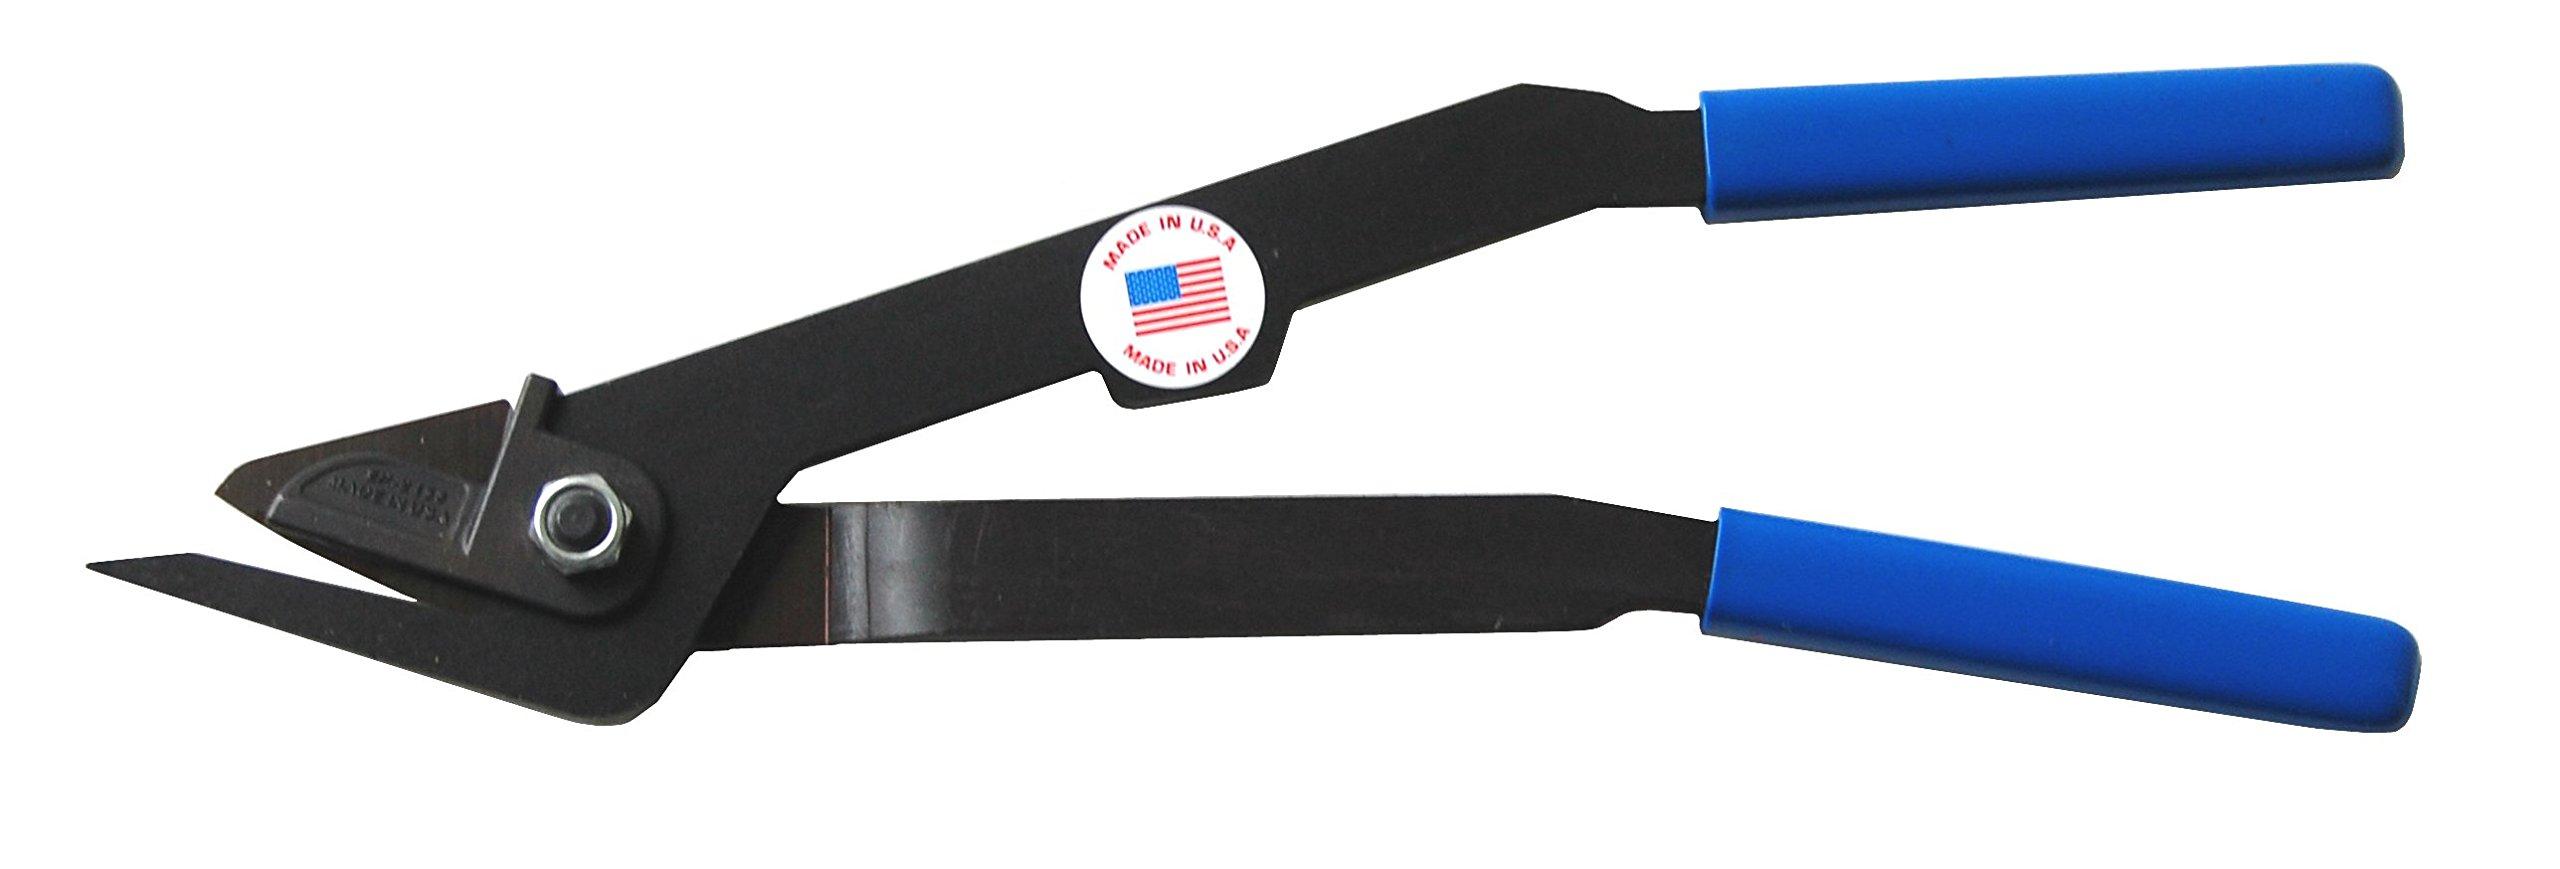 Steel Sealers & Cutters - Premium Strap Shears - EP-2450